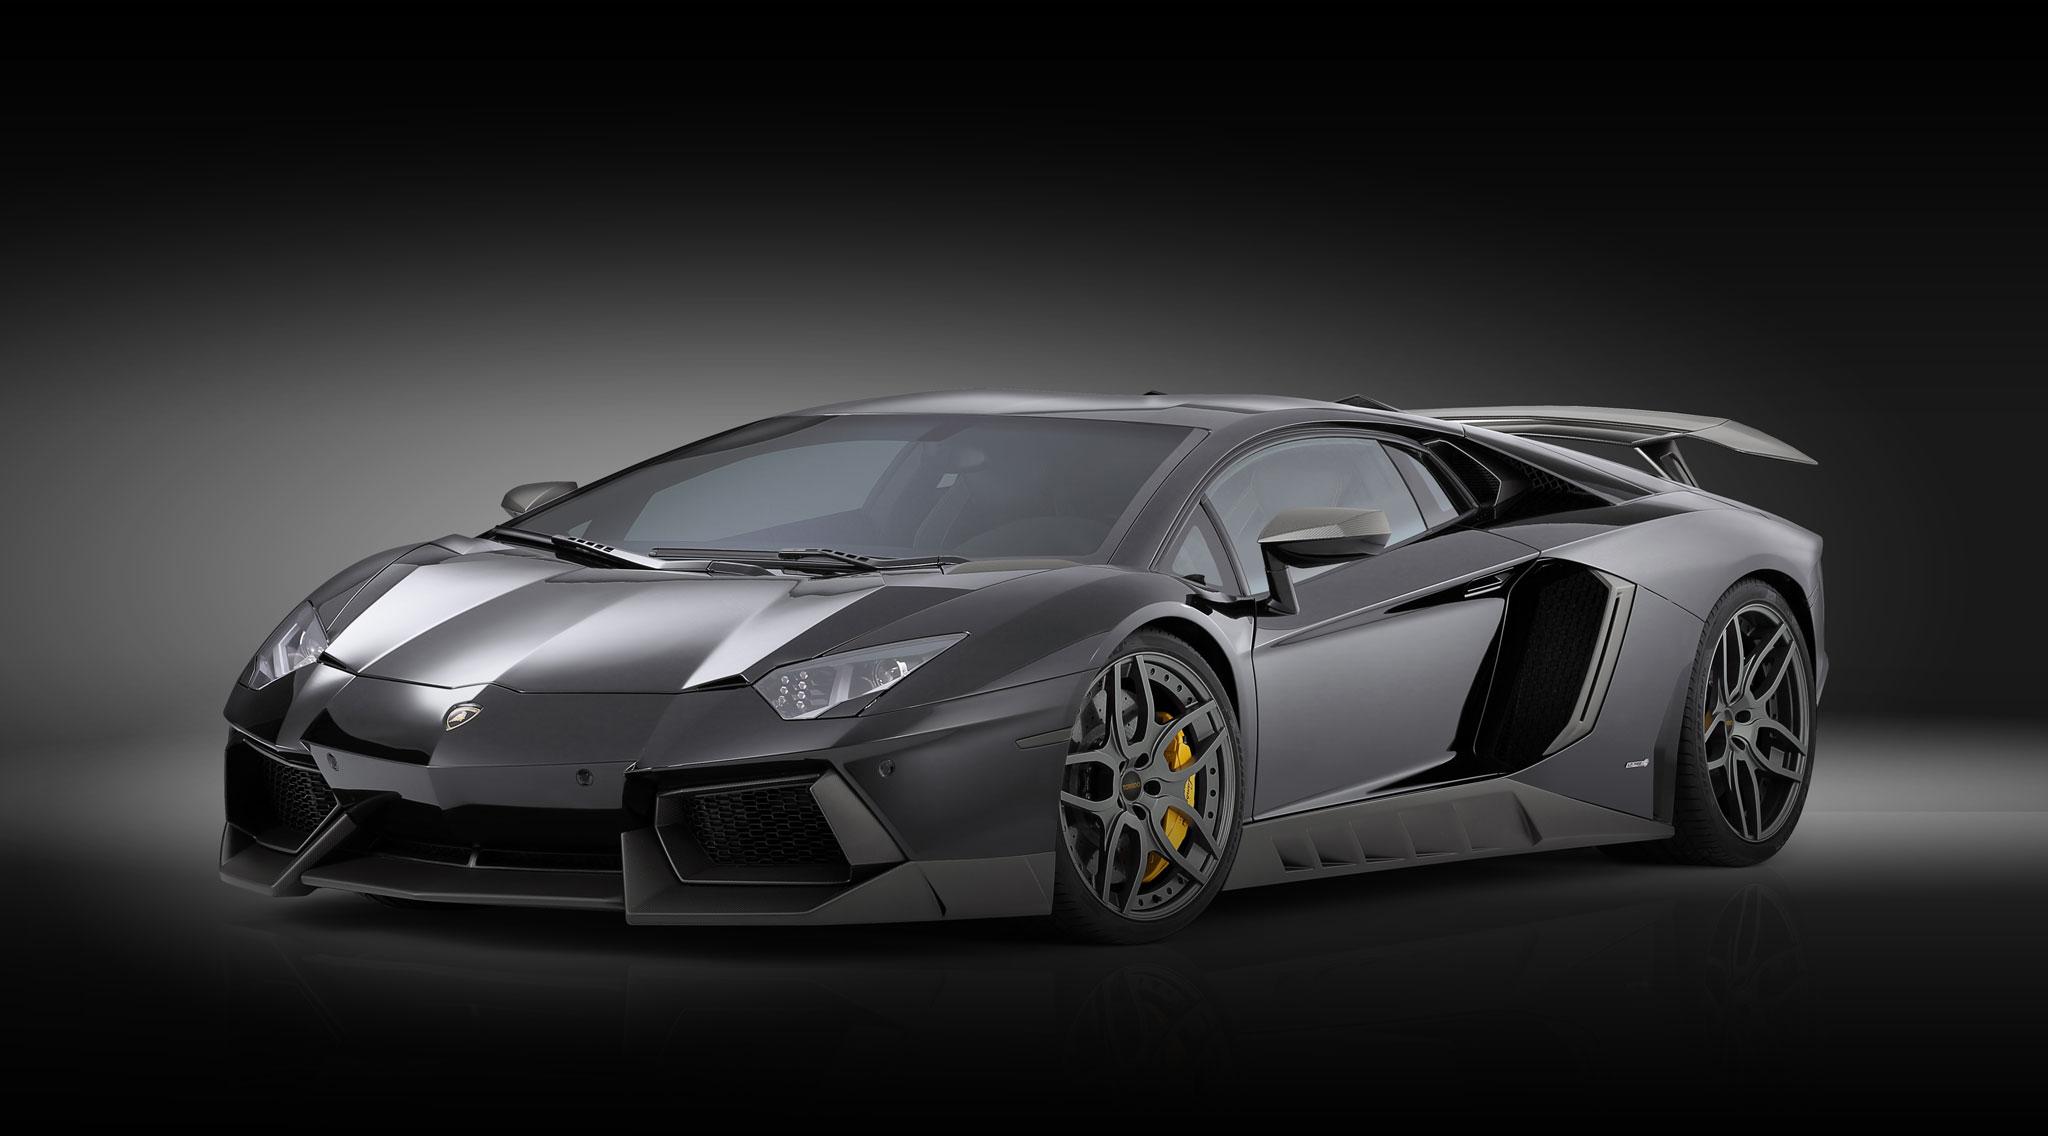 Nice Images Collection: Lamborghini Novitec Torado Desktop Wallpapers